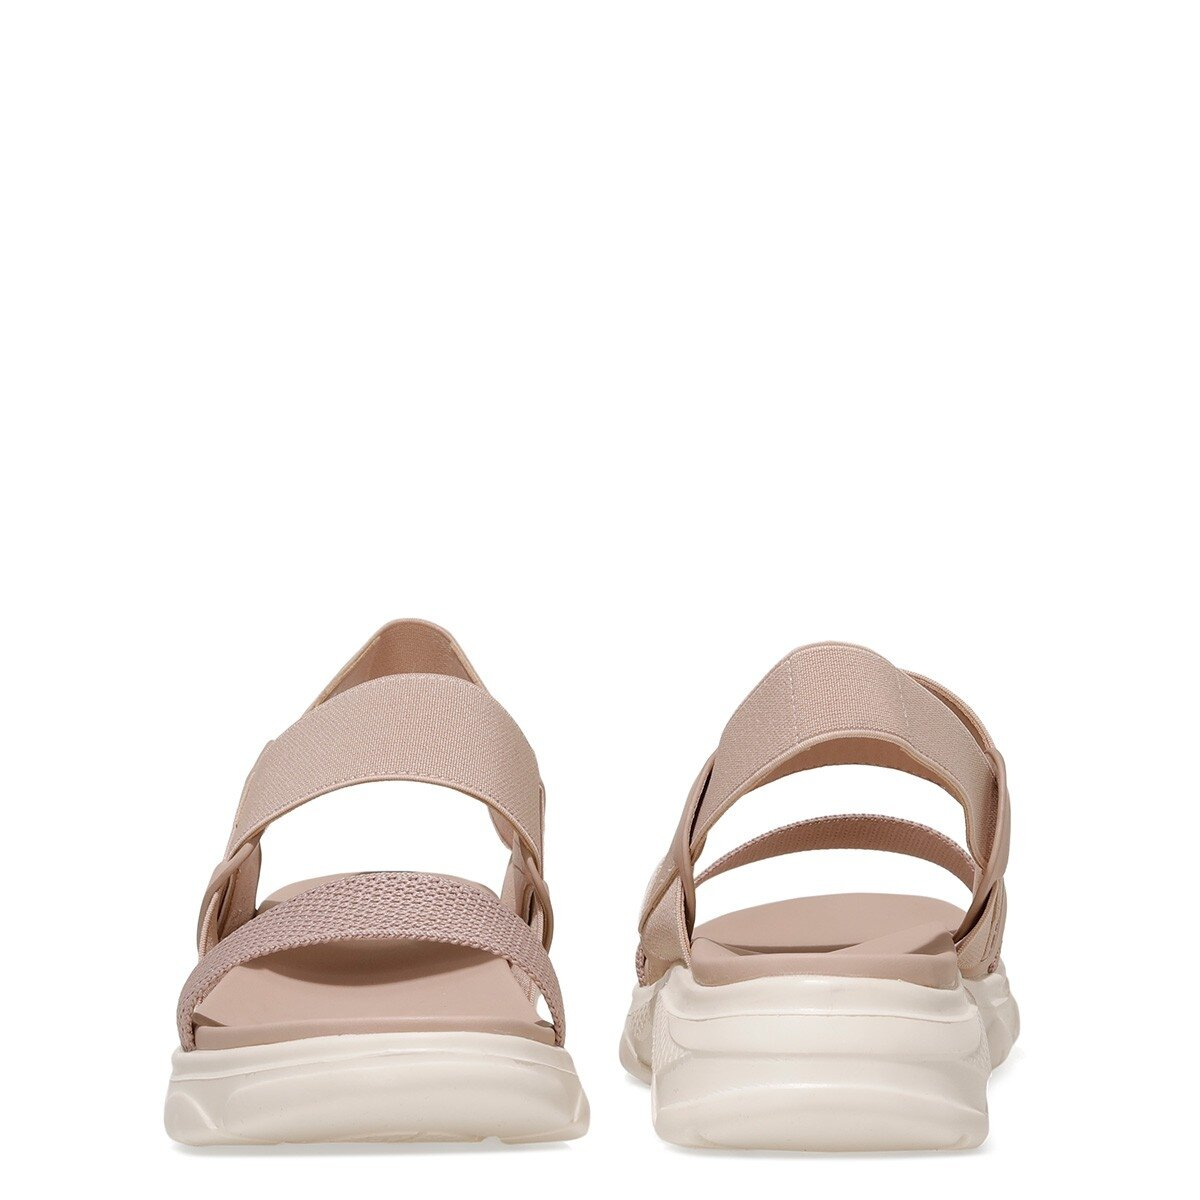 ABAUVIA 1FX Pembe Kadın Sandalet